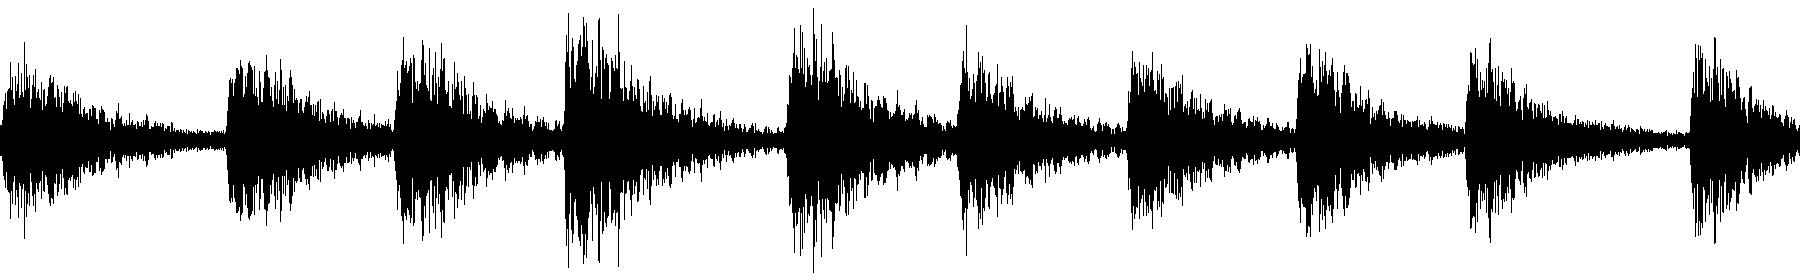 shs ch musicloop 125 piano1 amgm